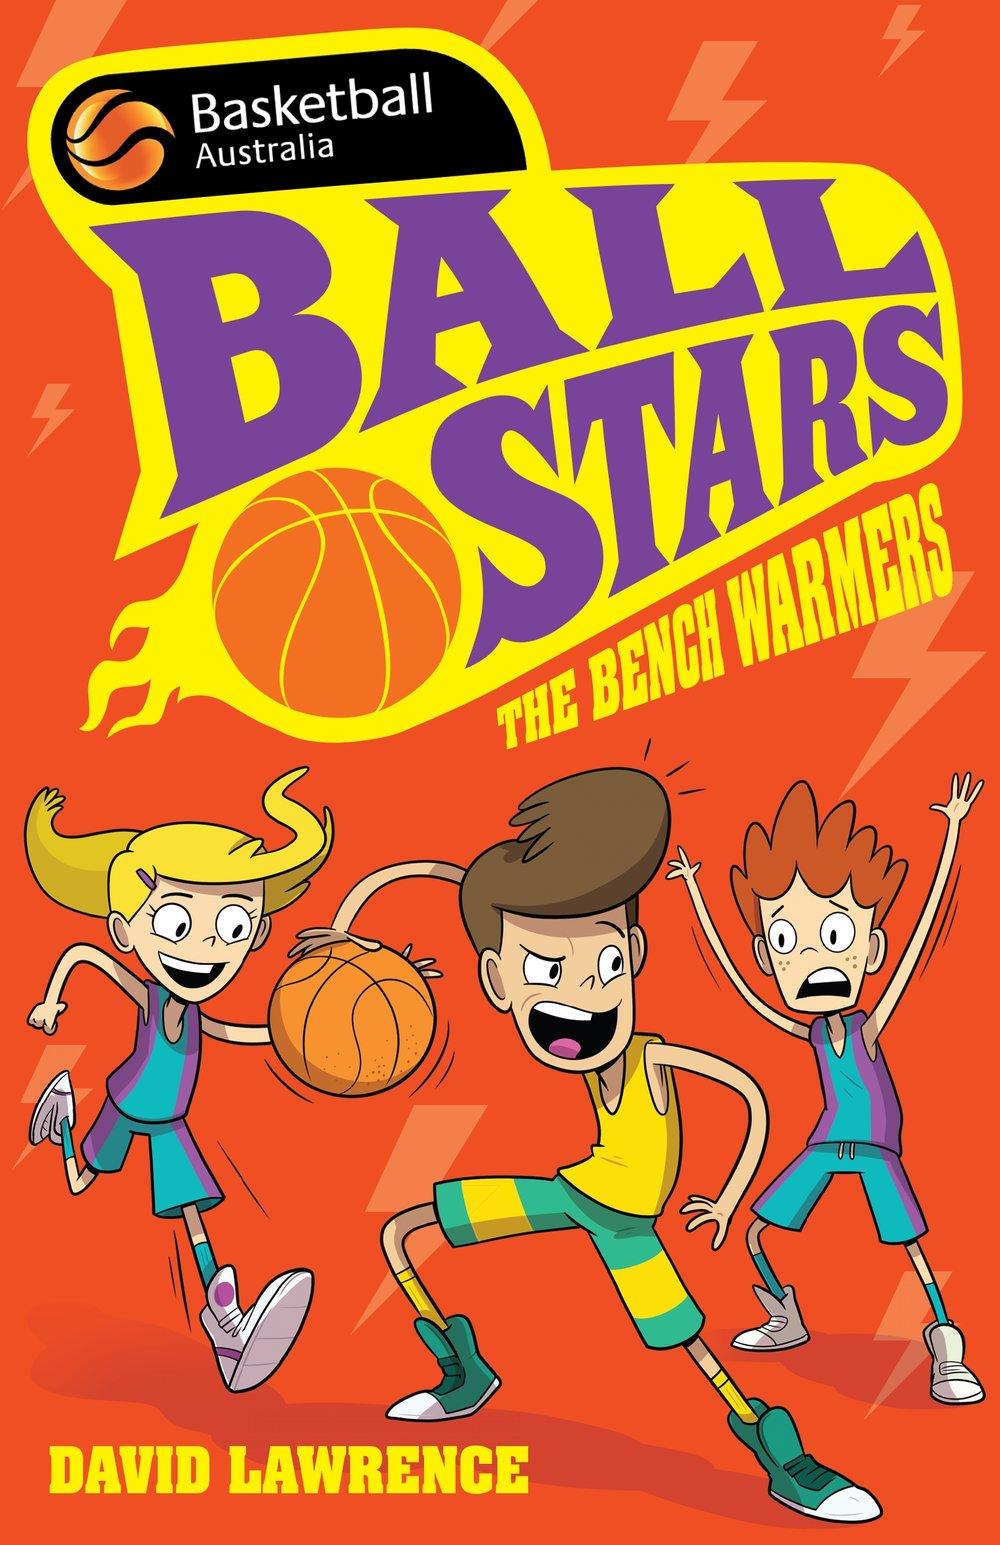 Ball Stars Bench Warmers.jpg